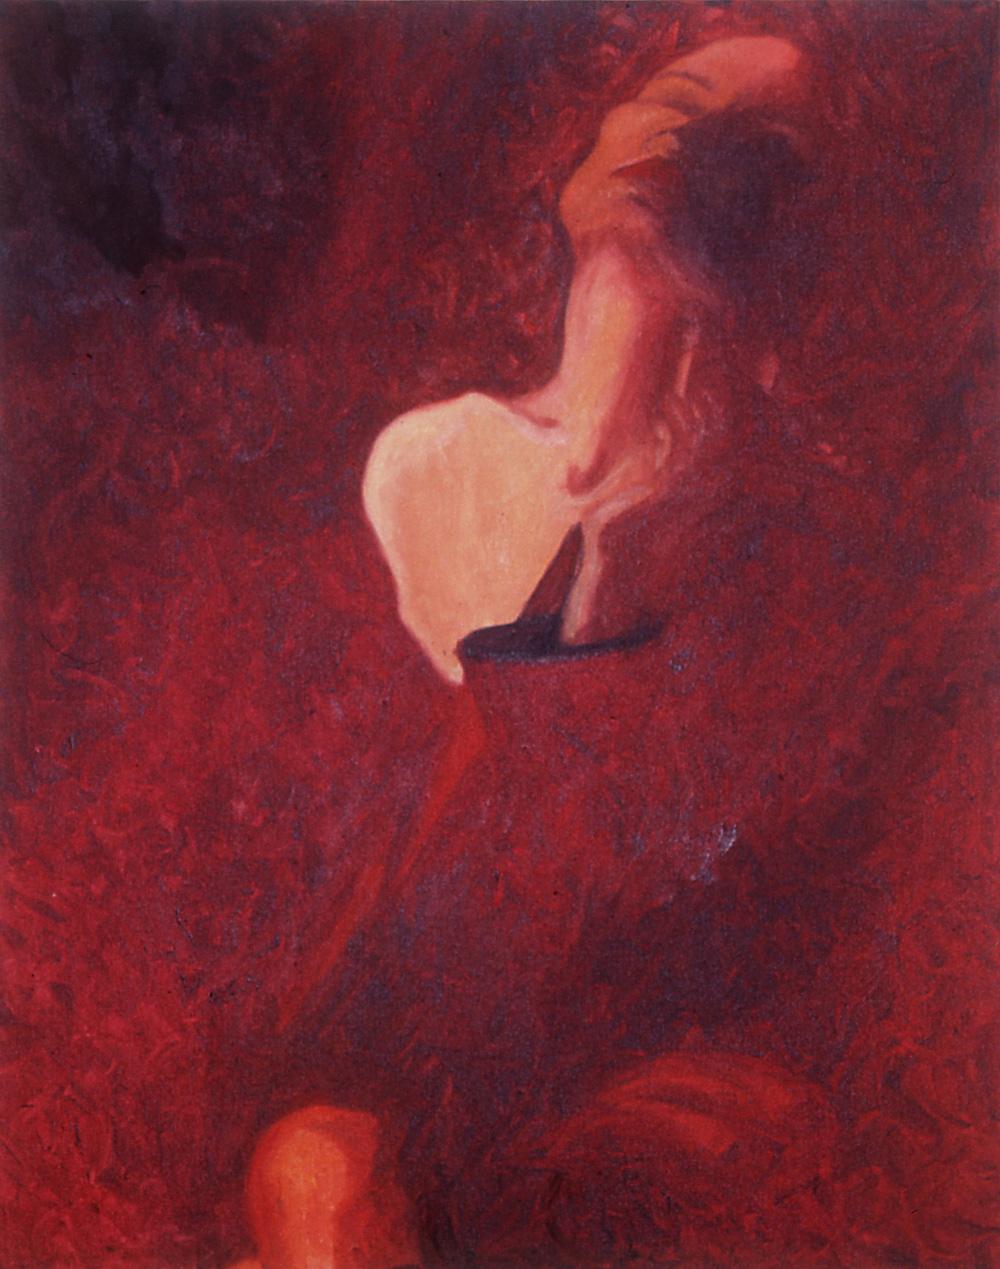 Indira-Cesarine-Woman-Smoking-Oil-On-Canvas-1987-LR.jpg